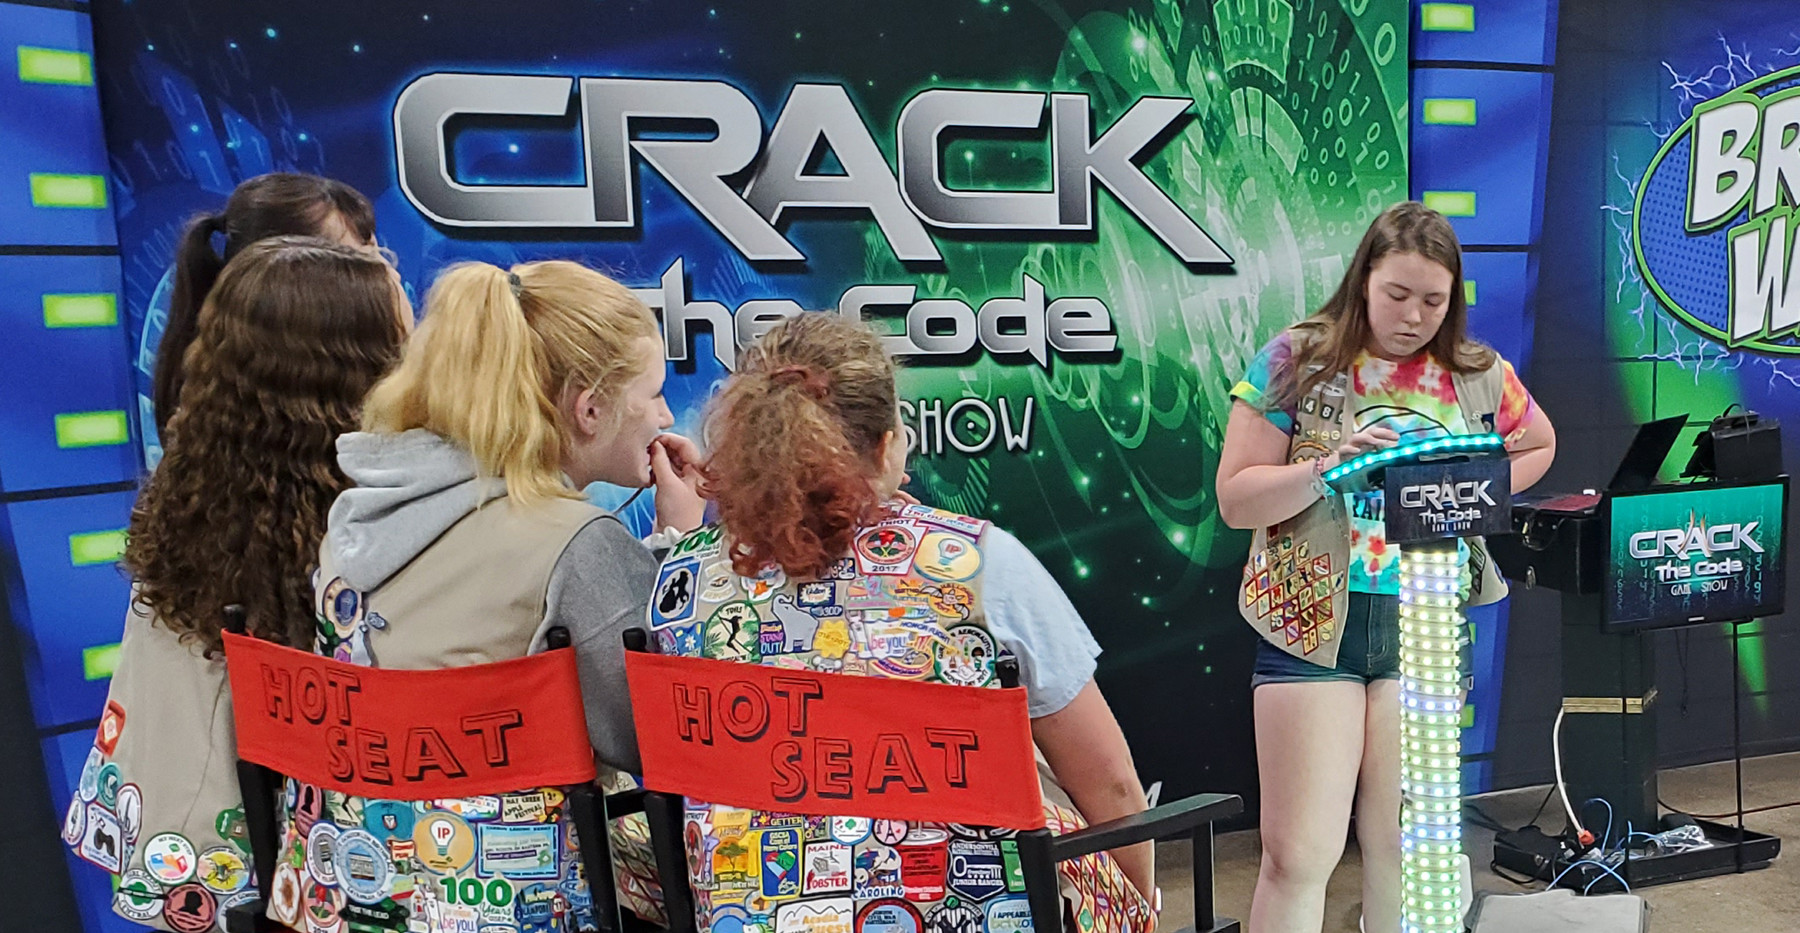 CrackCode pic 4.jpg